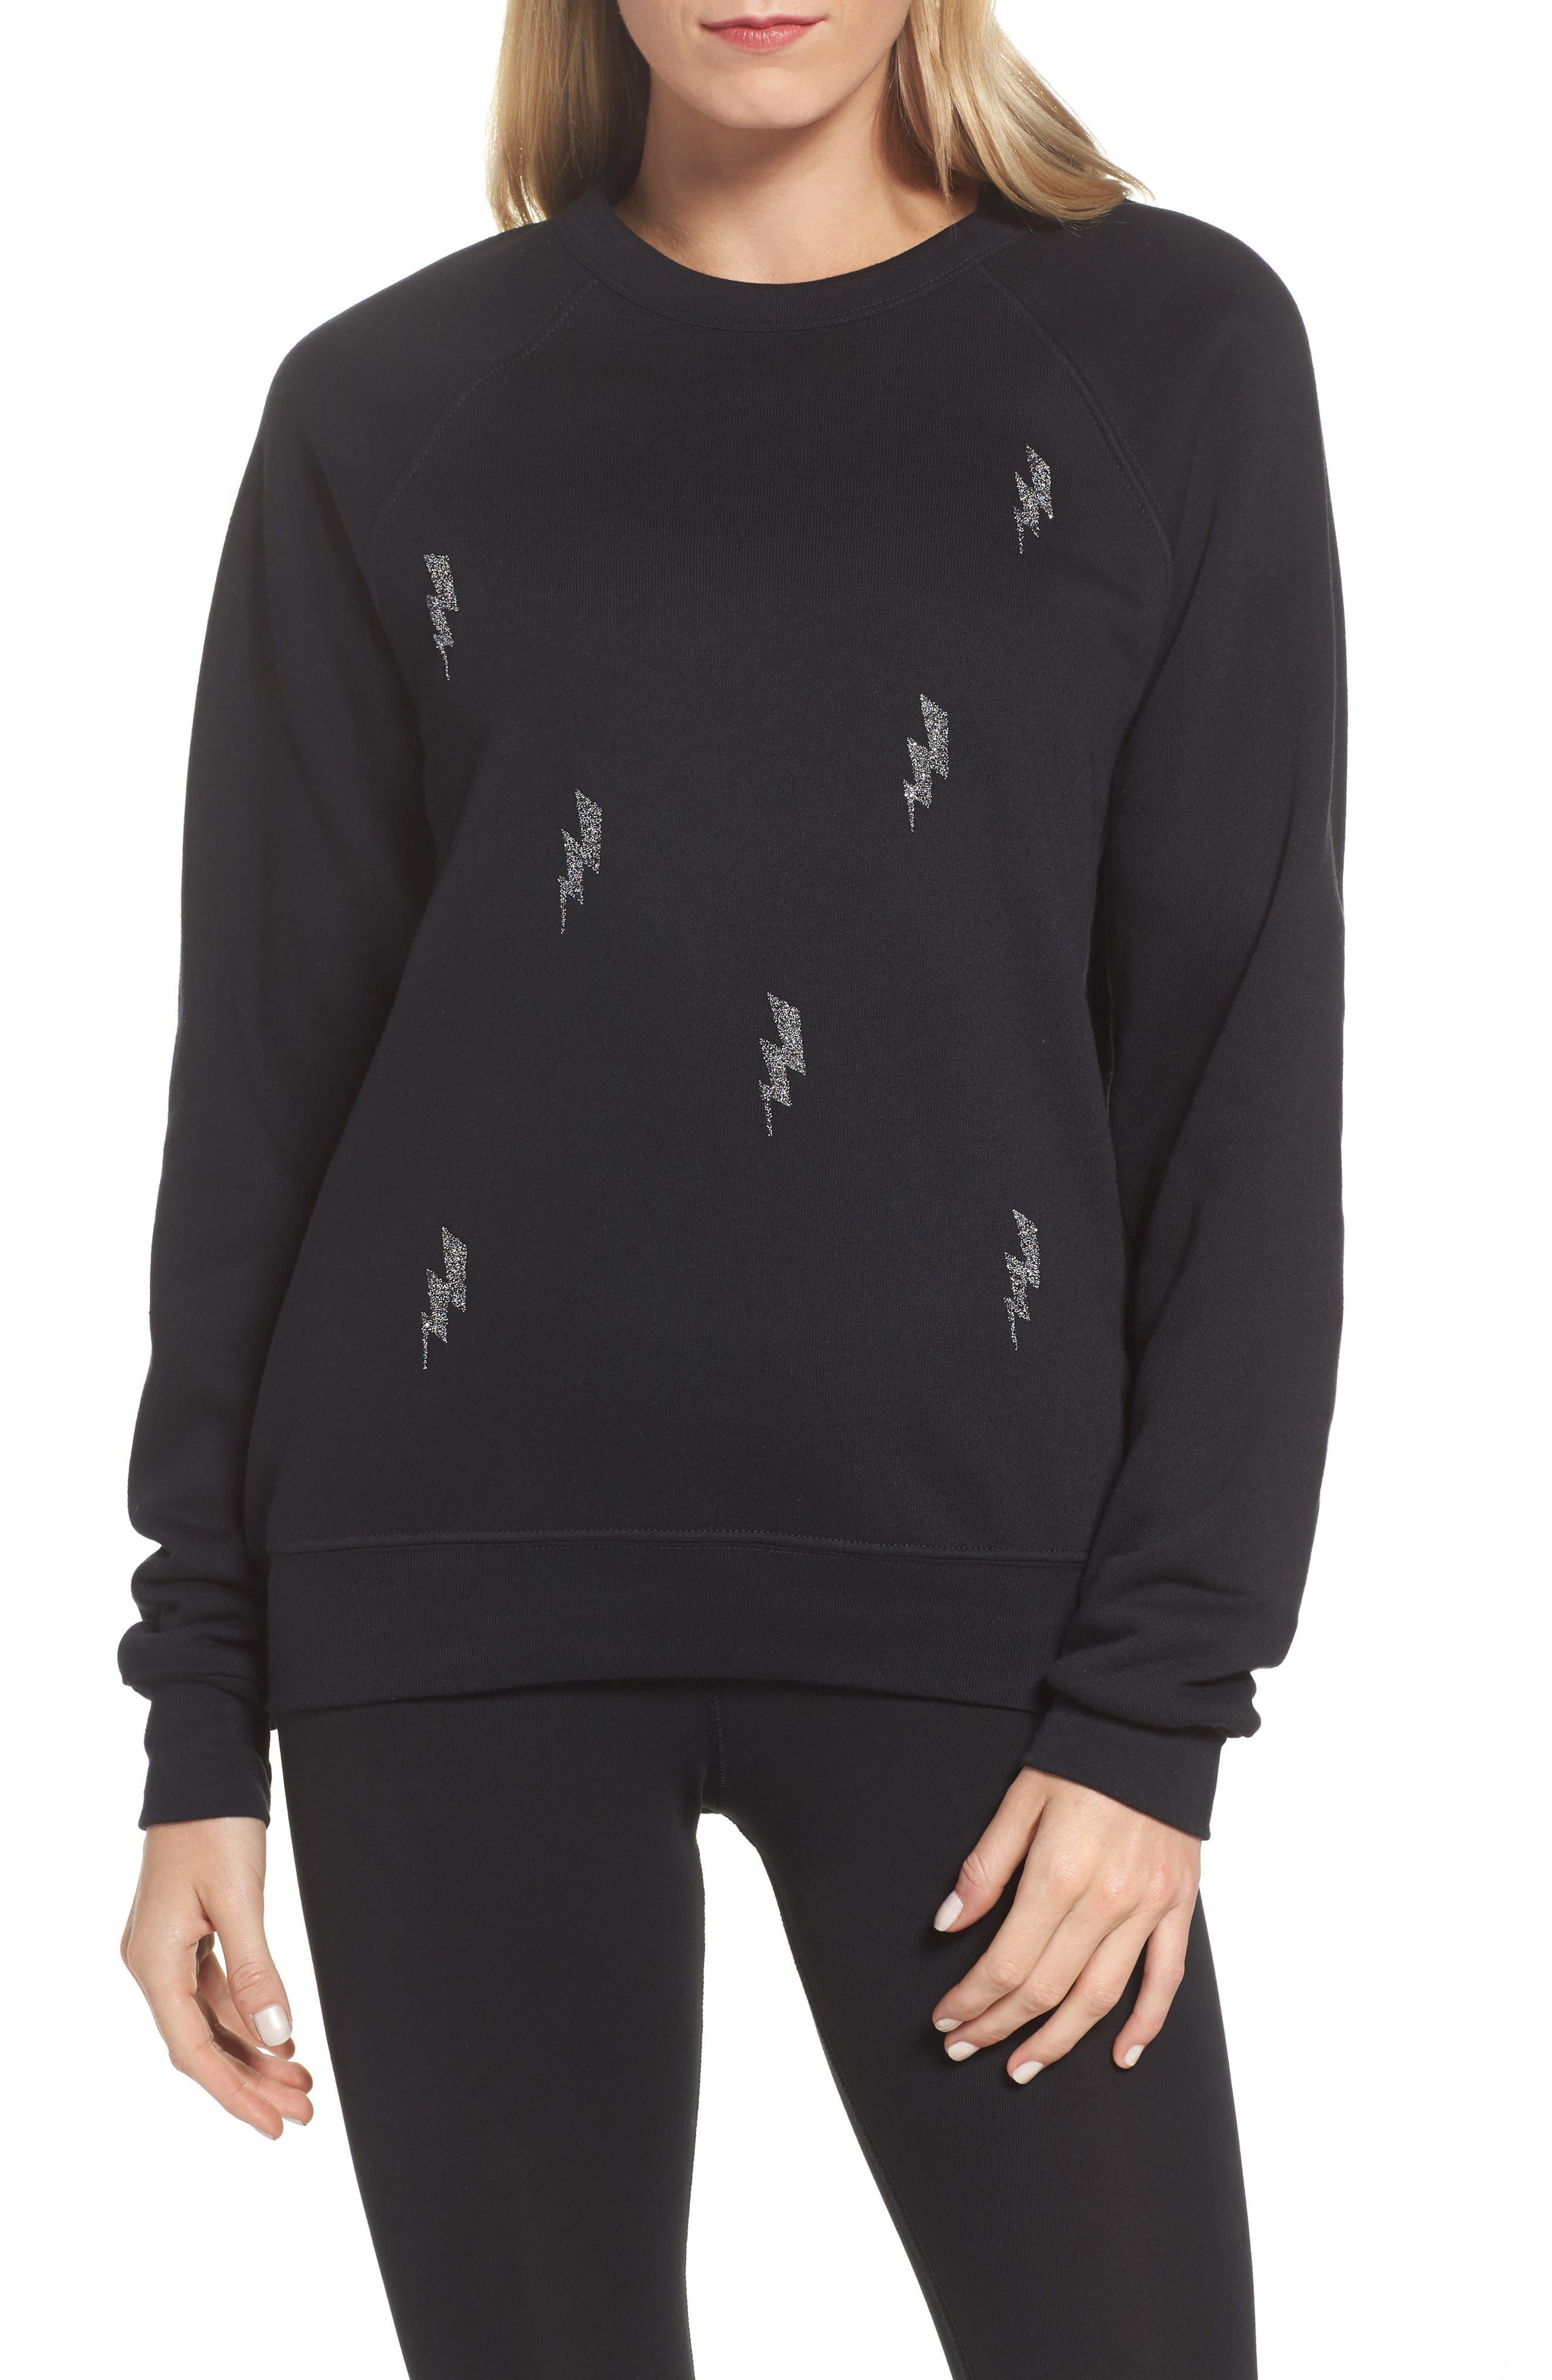 Swarovski Bolt Sweatshirt,                             Main thumbnail 1, color,                             001